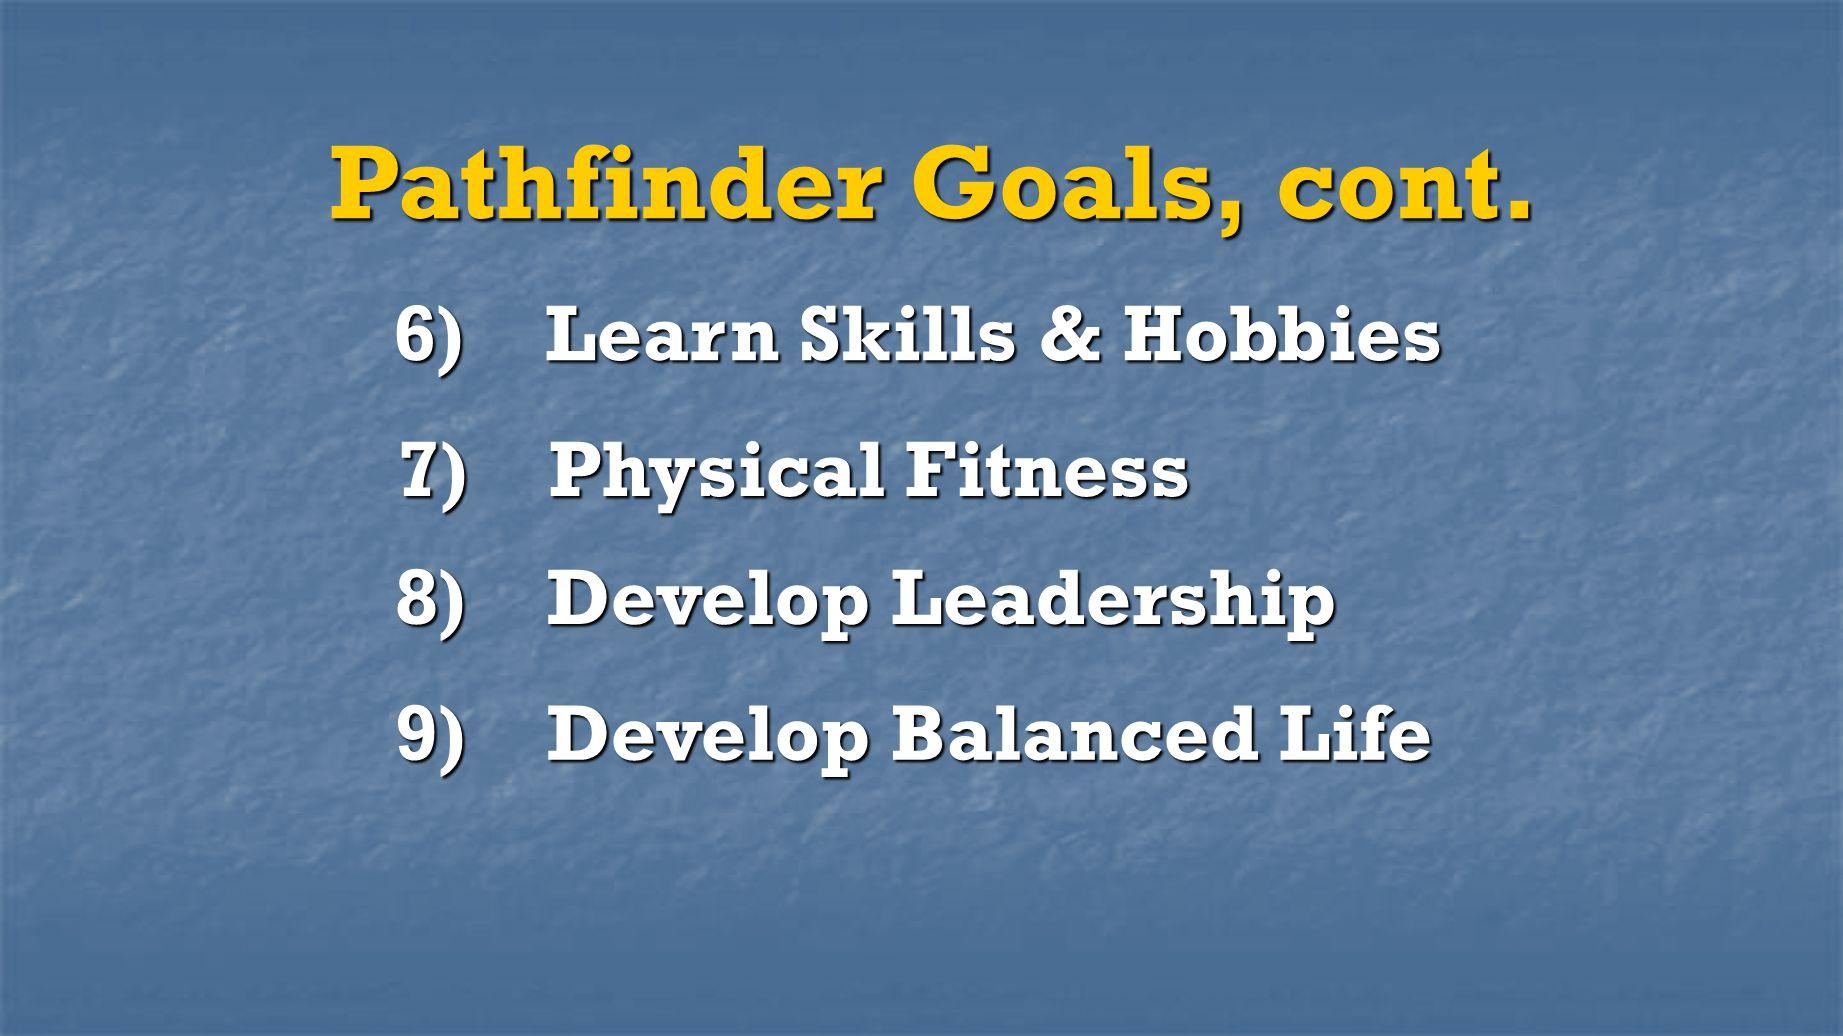 6) Learn Skills & Hobbies 9) Develop Balanced Life